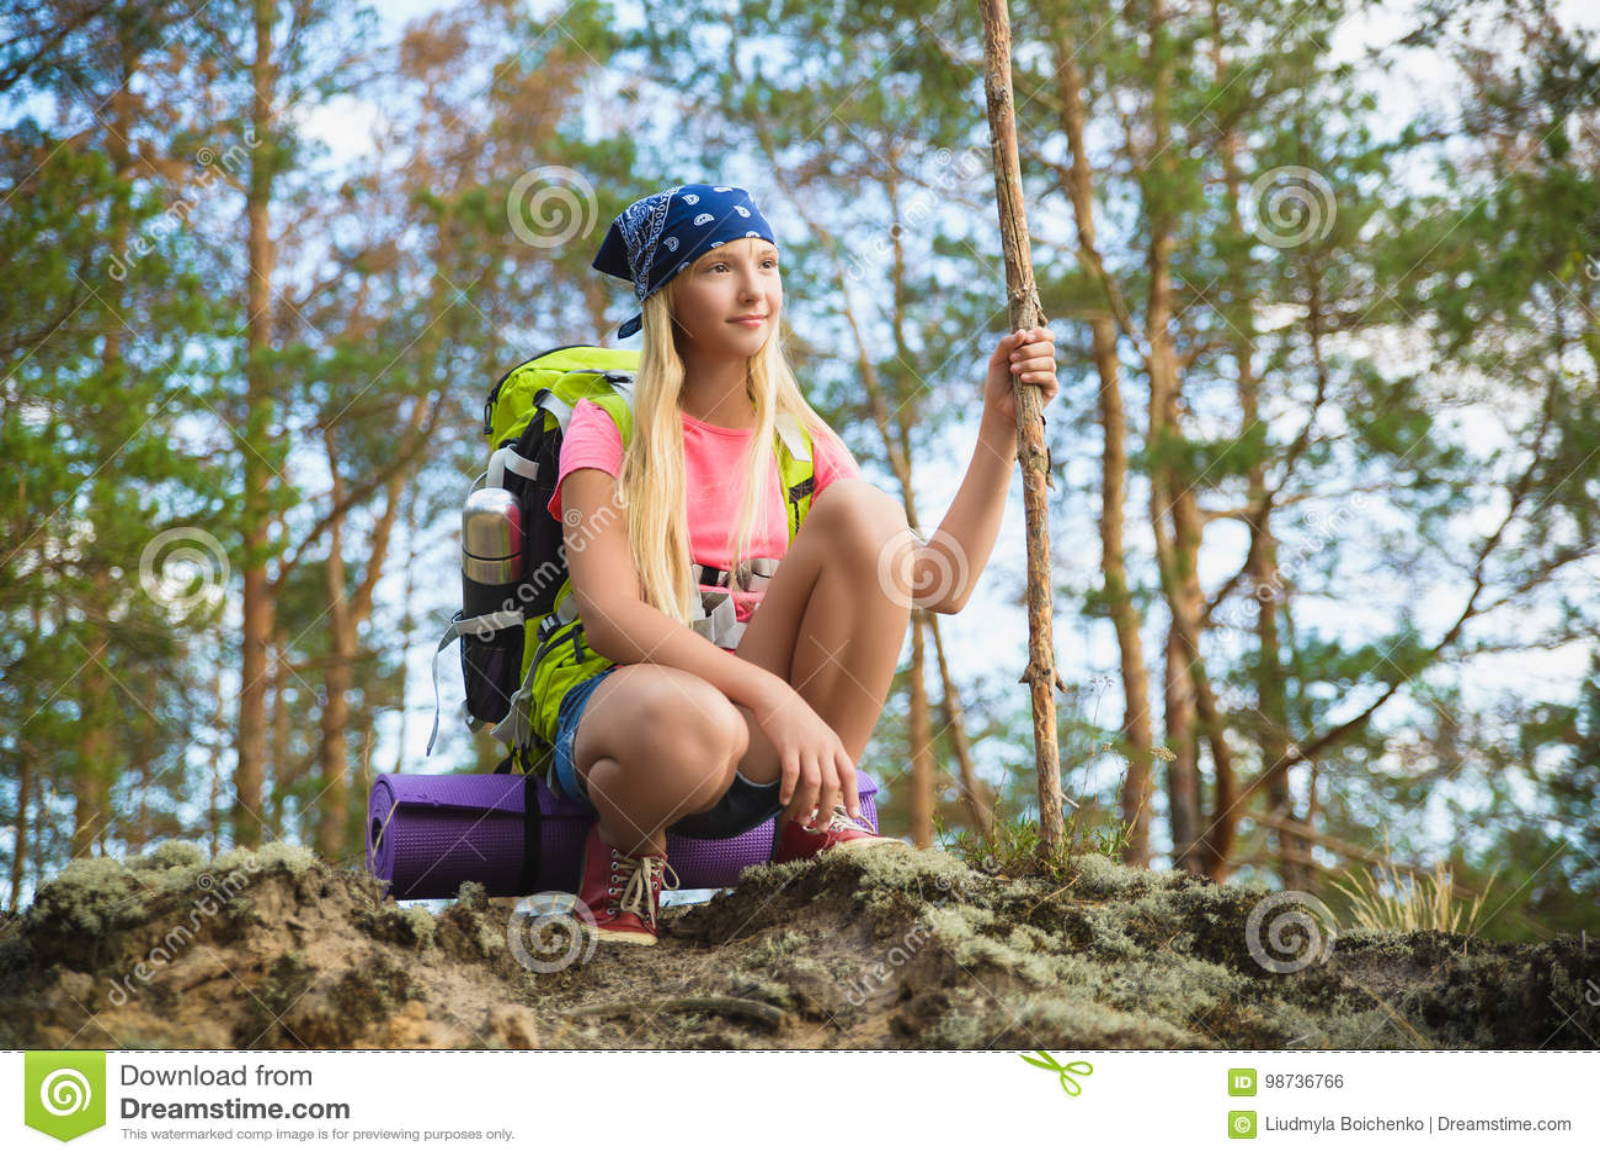 Meisjesreiziger met rugzak in heuvel bosavontuur, reis, toerismeconcept